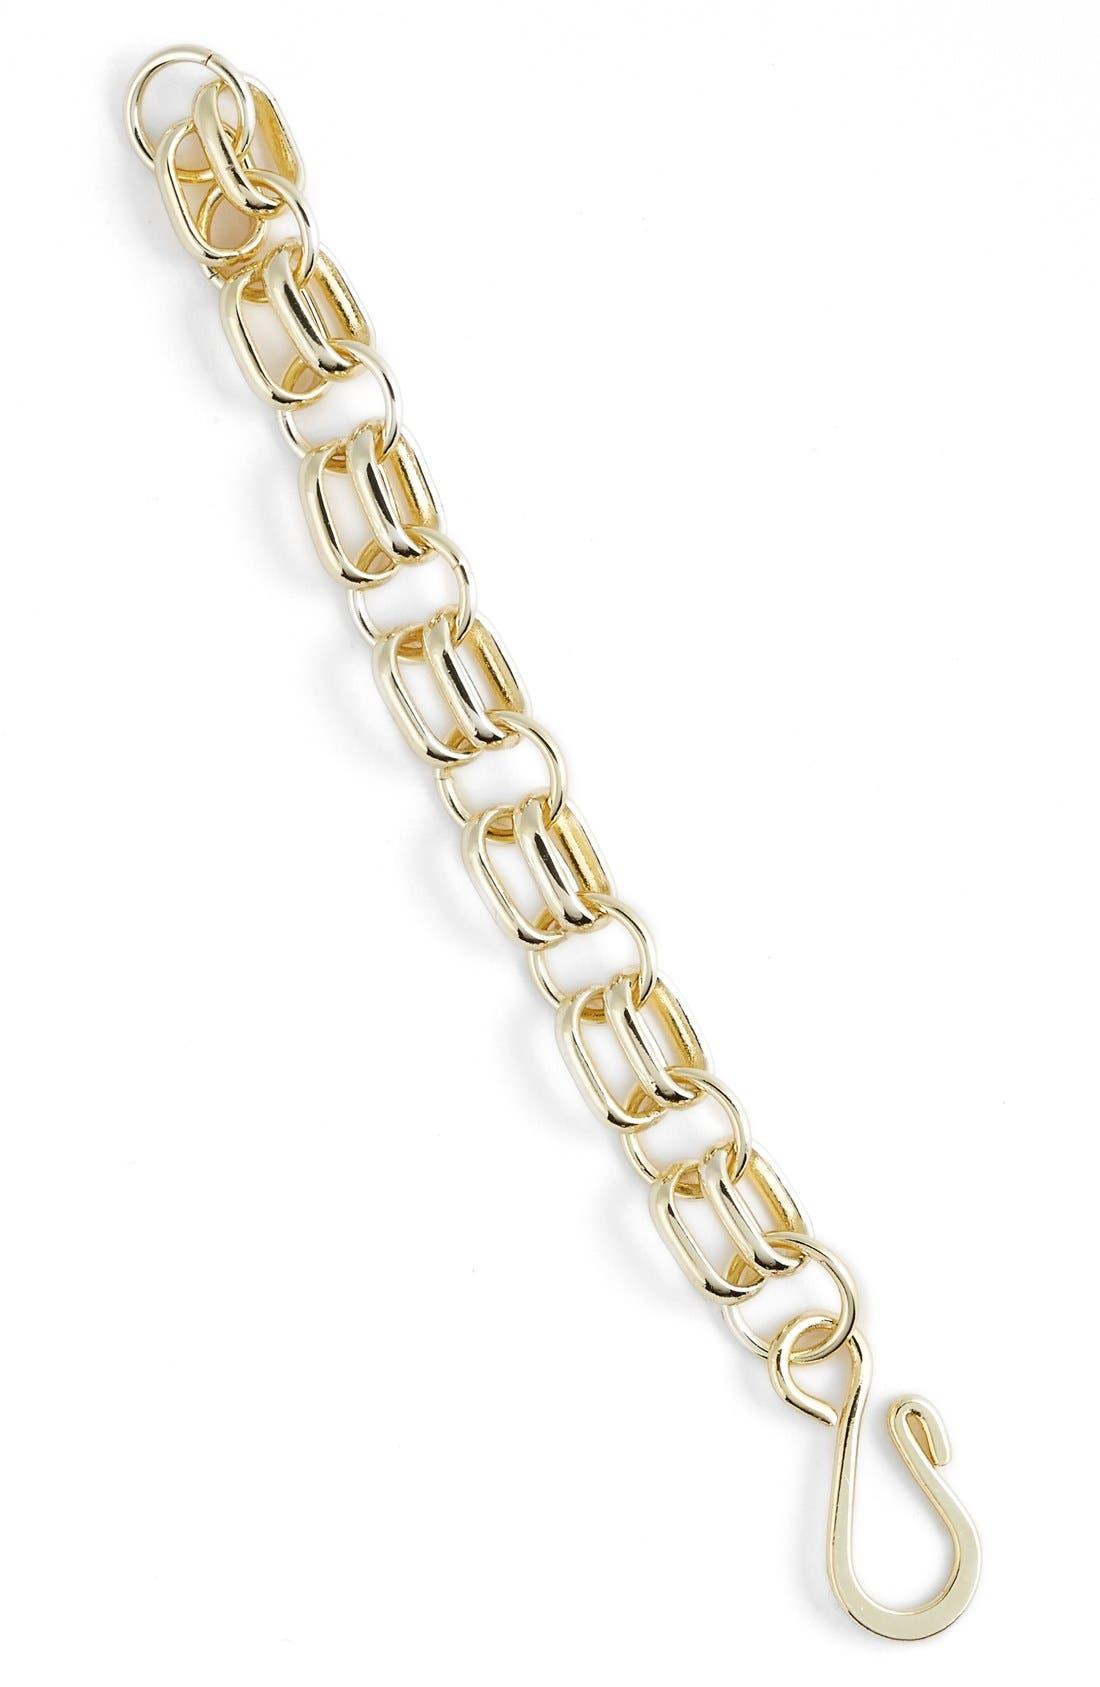 KENDRA SCOTT 4-Inch Necklace Extender